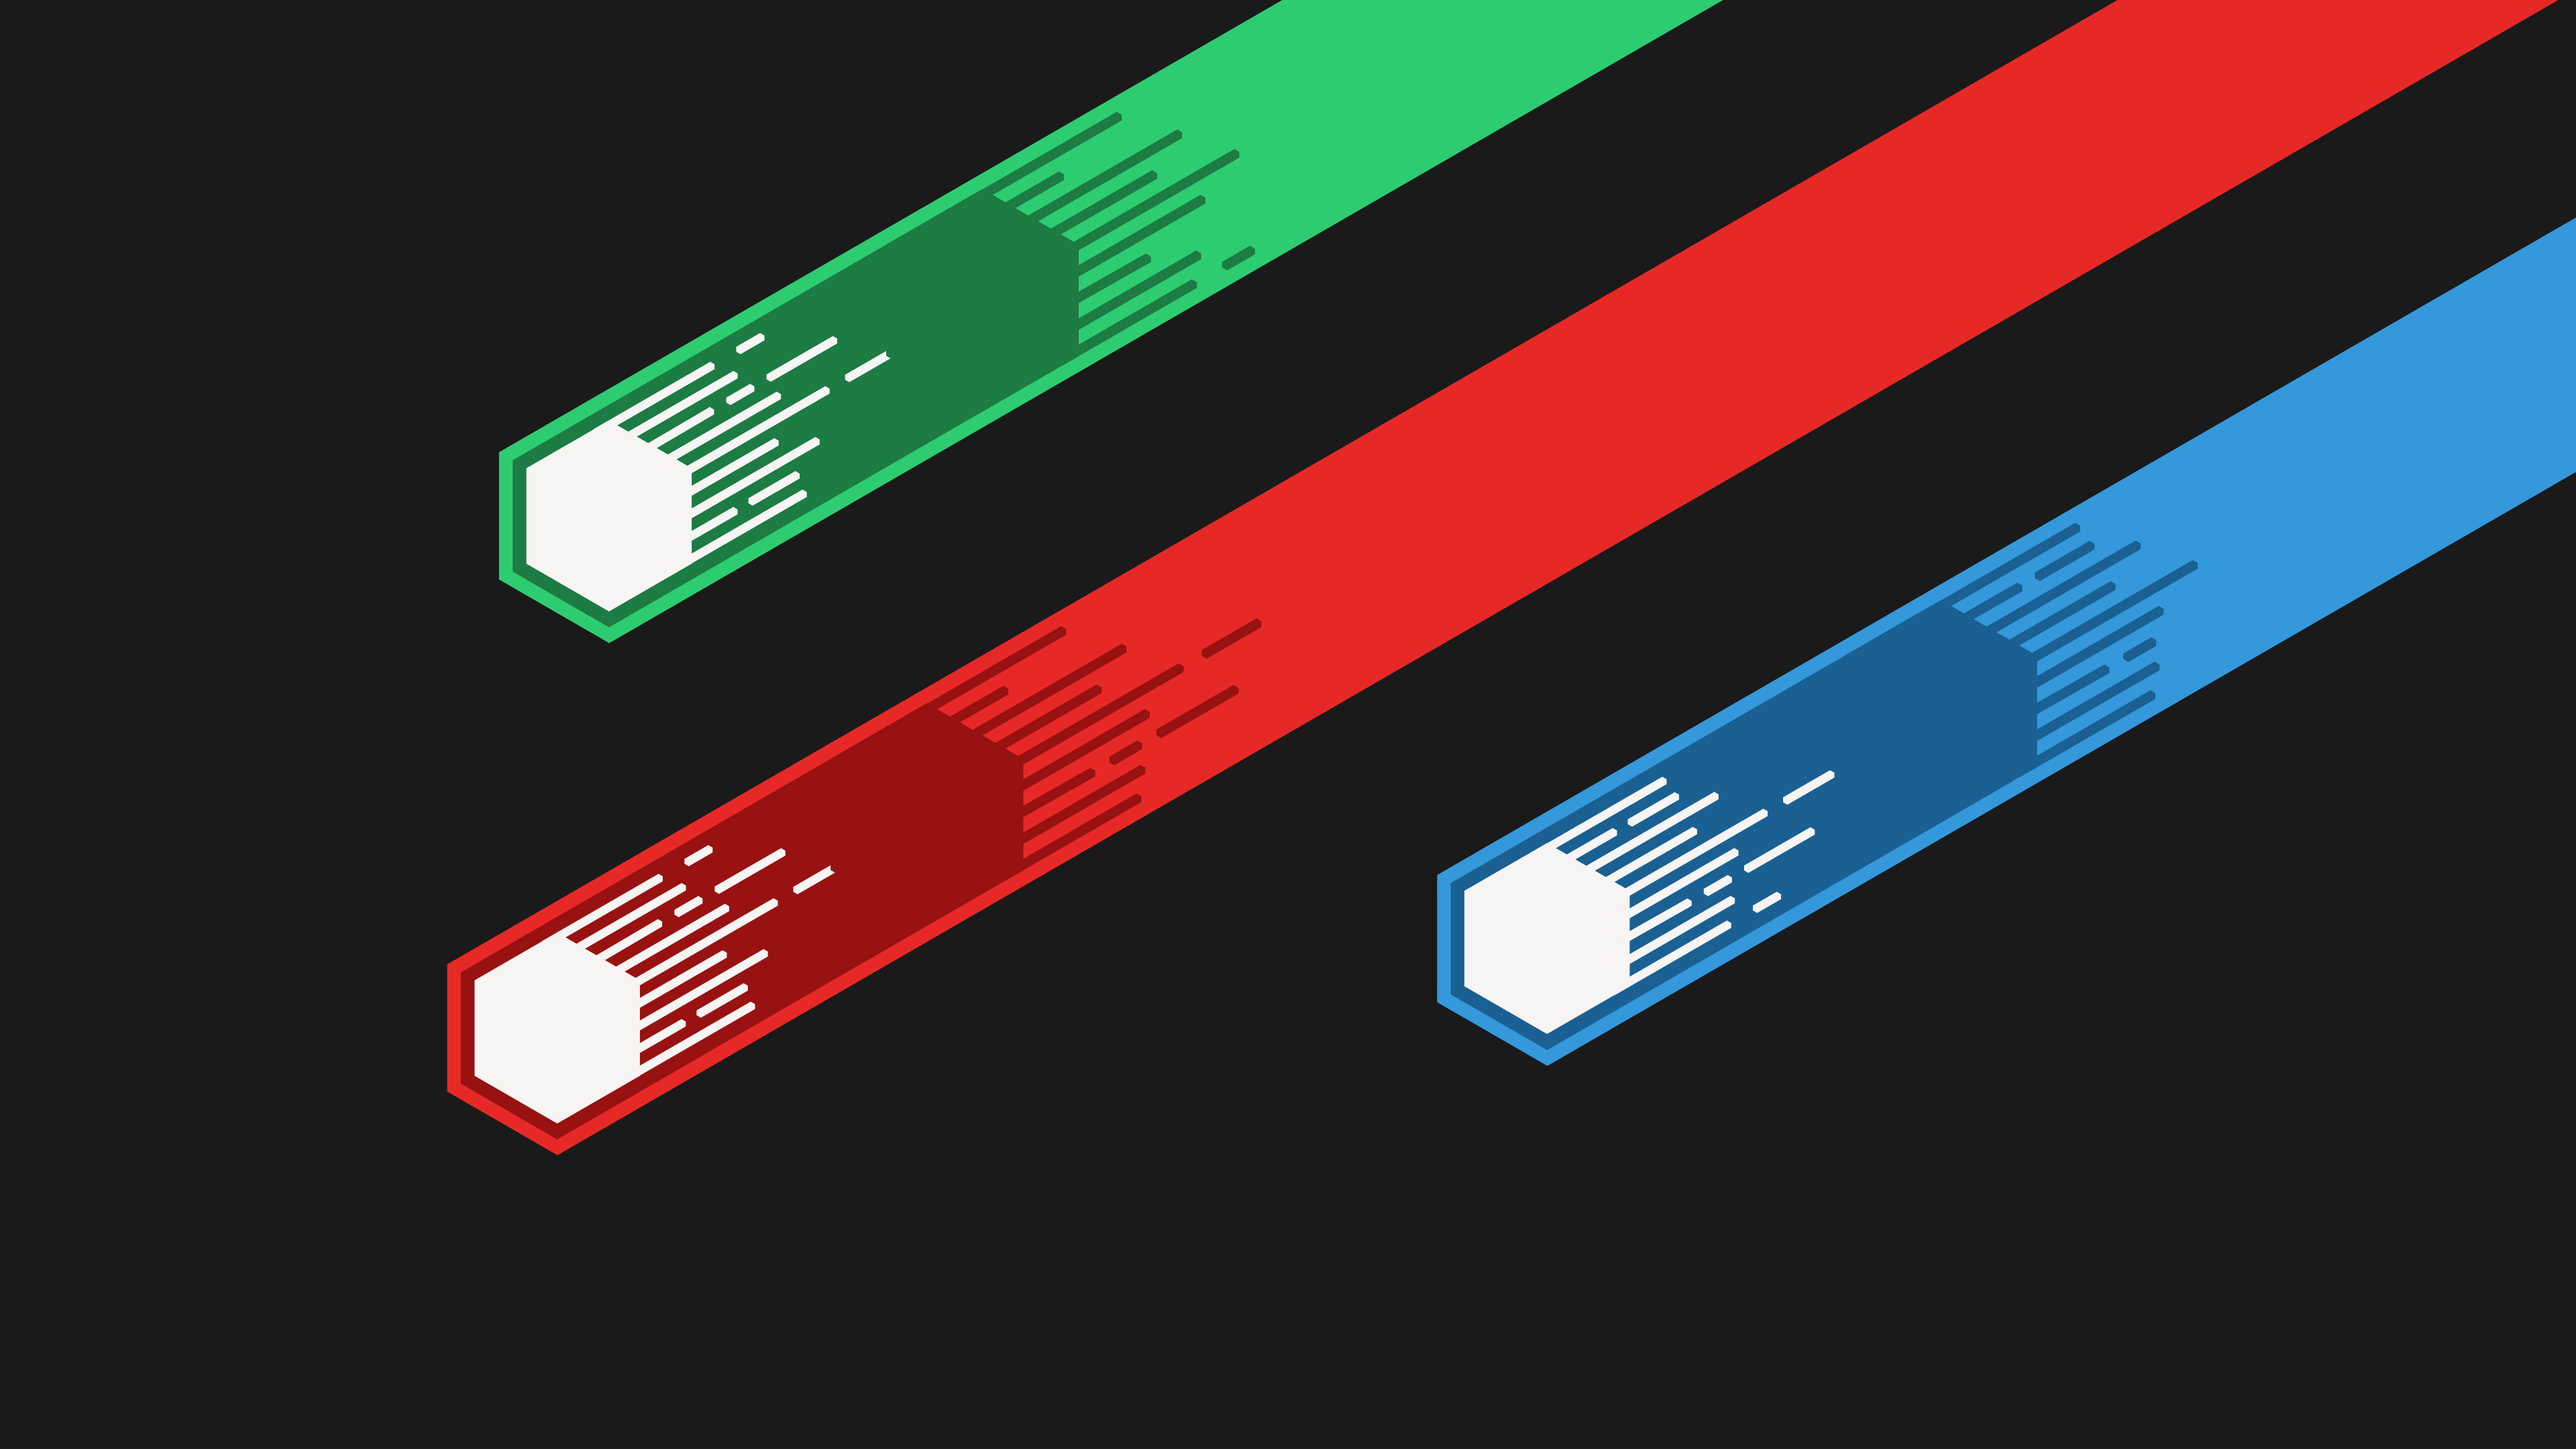 Three green, red, and blue stripe logo, meteors, Flatdesign.